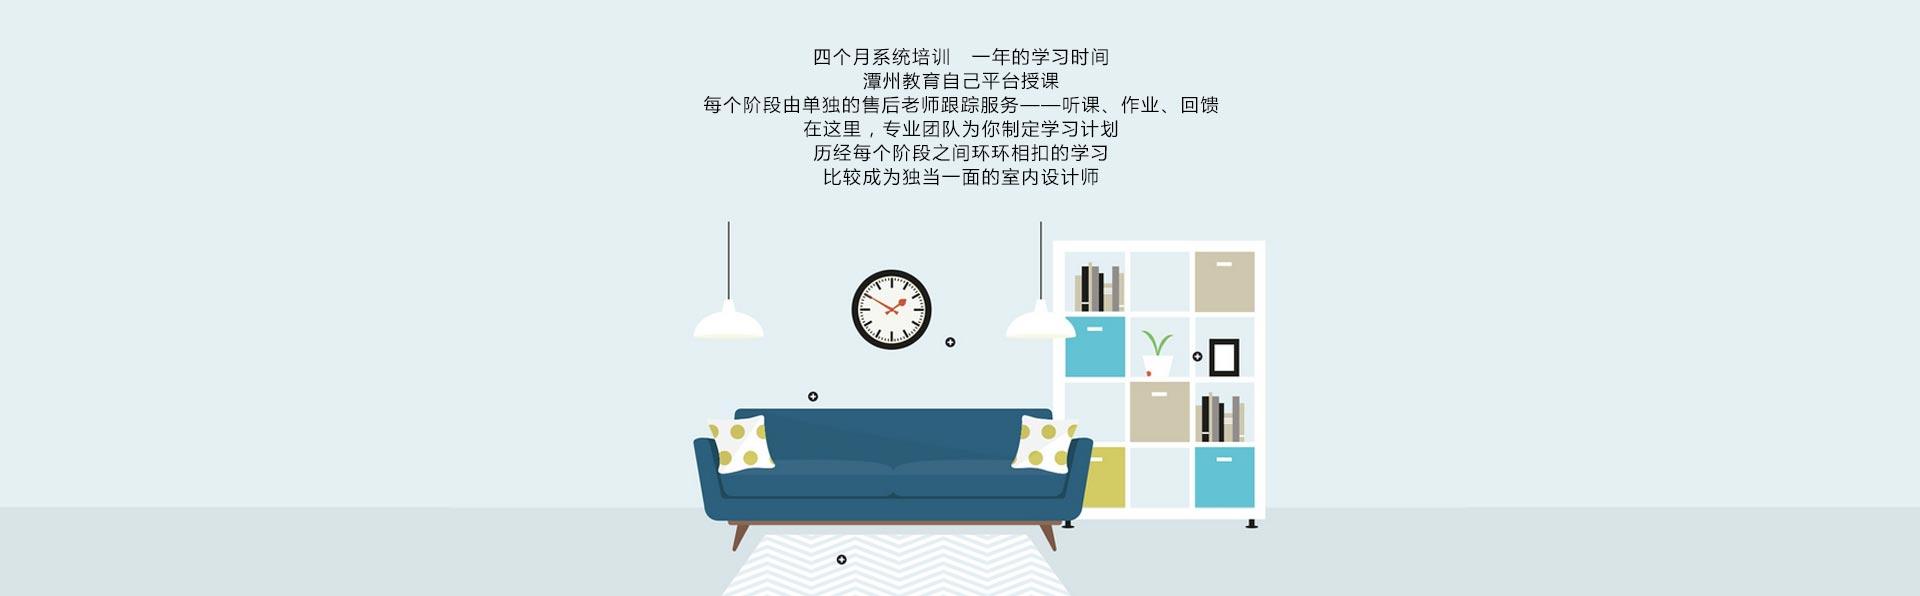 预约试听 报名咨询: http://static.tanzhouedu.com/style/special/indoor/index.html